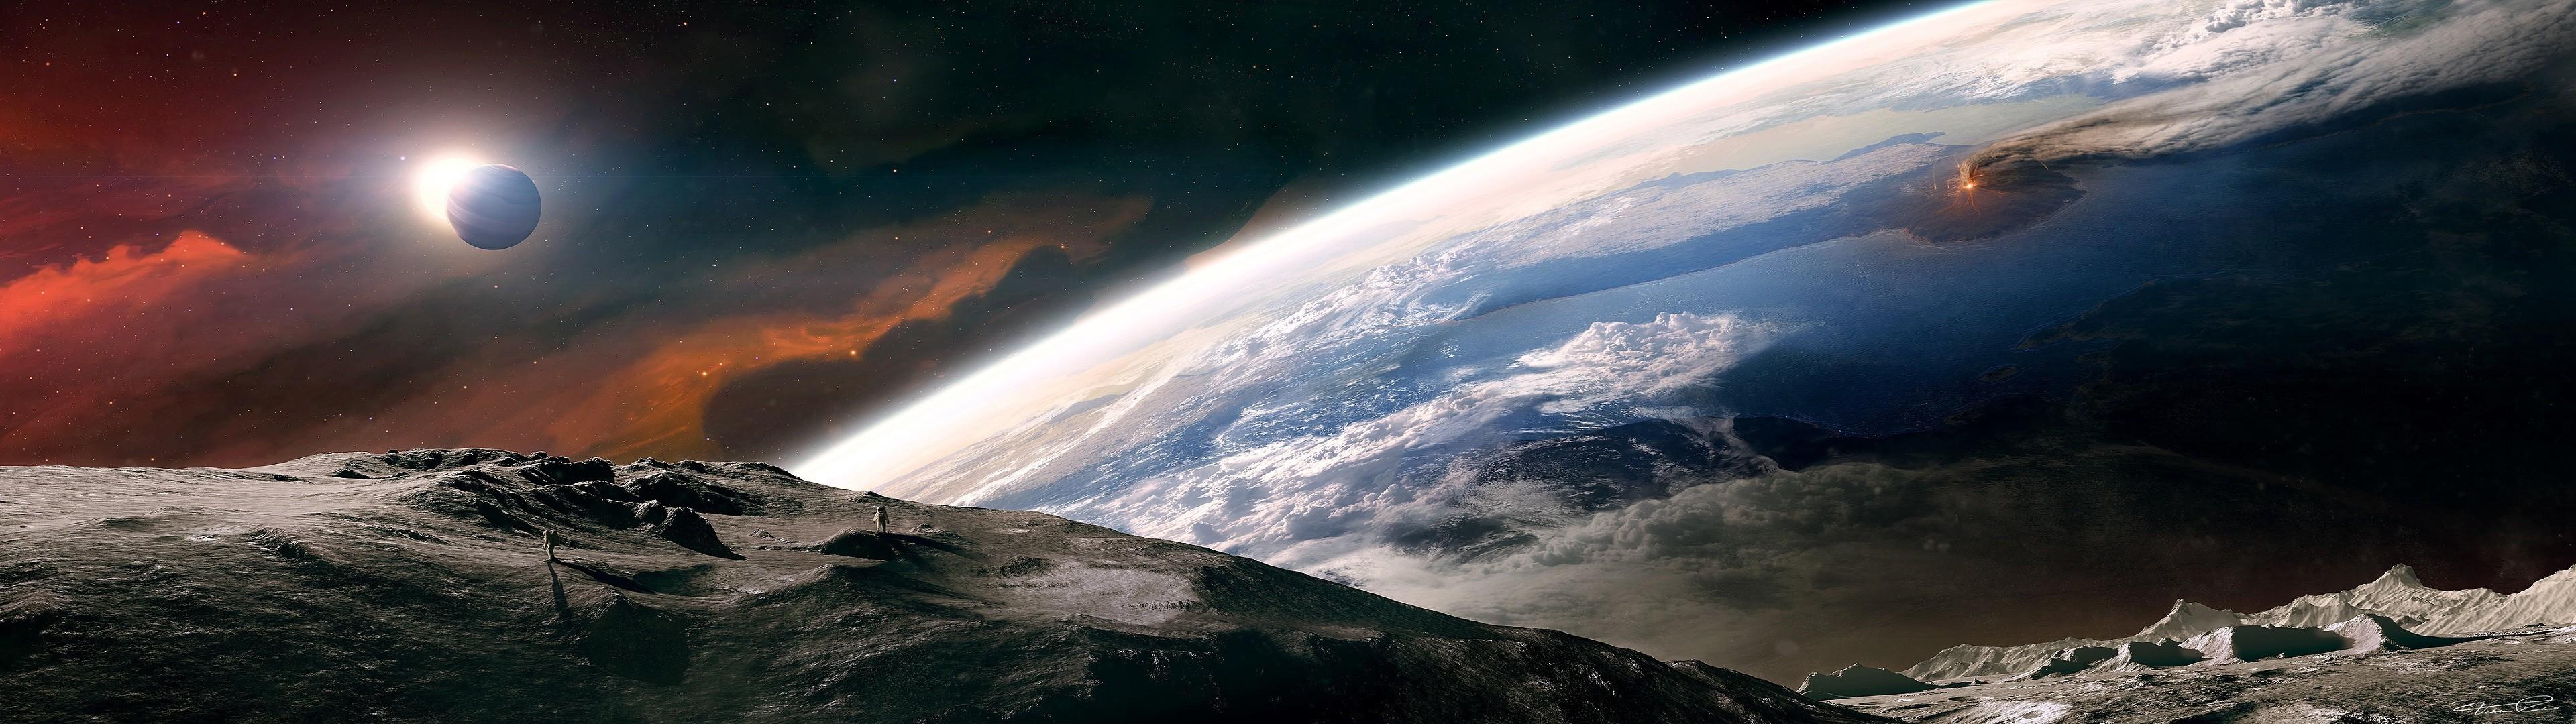 wallpaper planet · space · dual screen